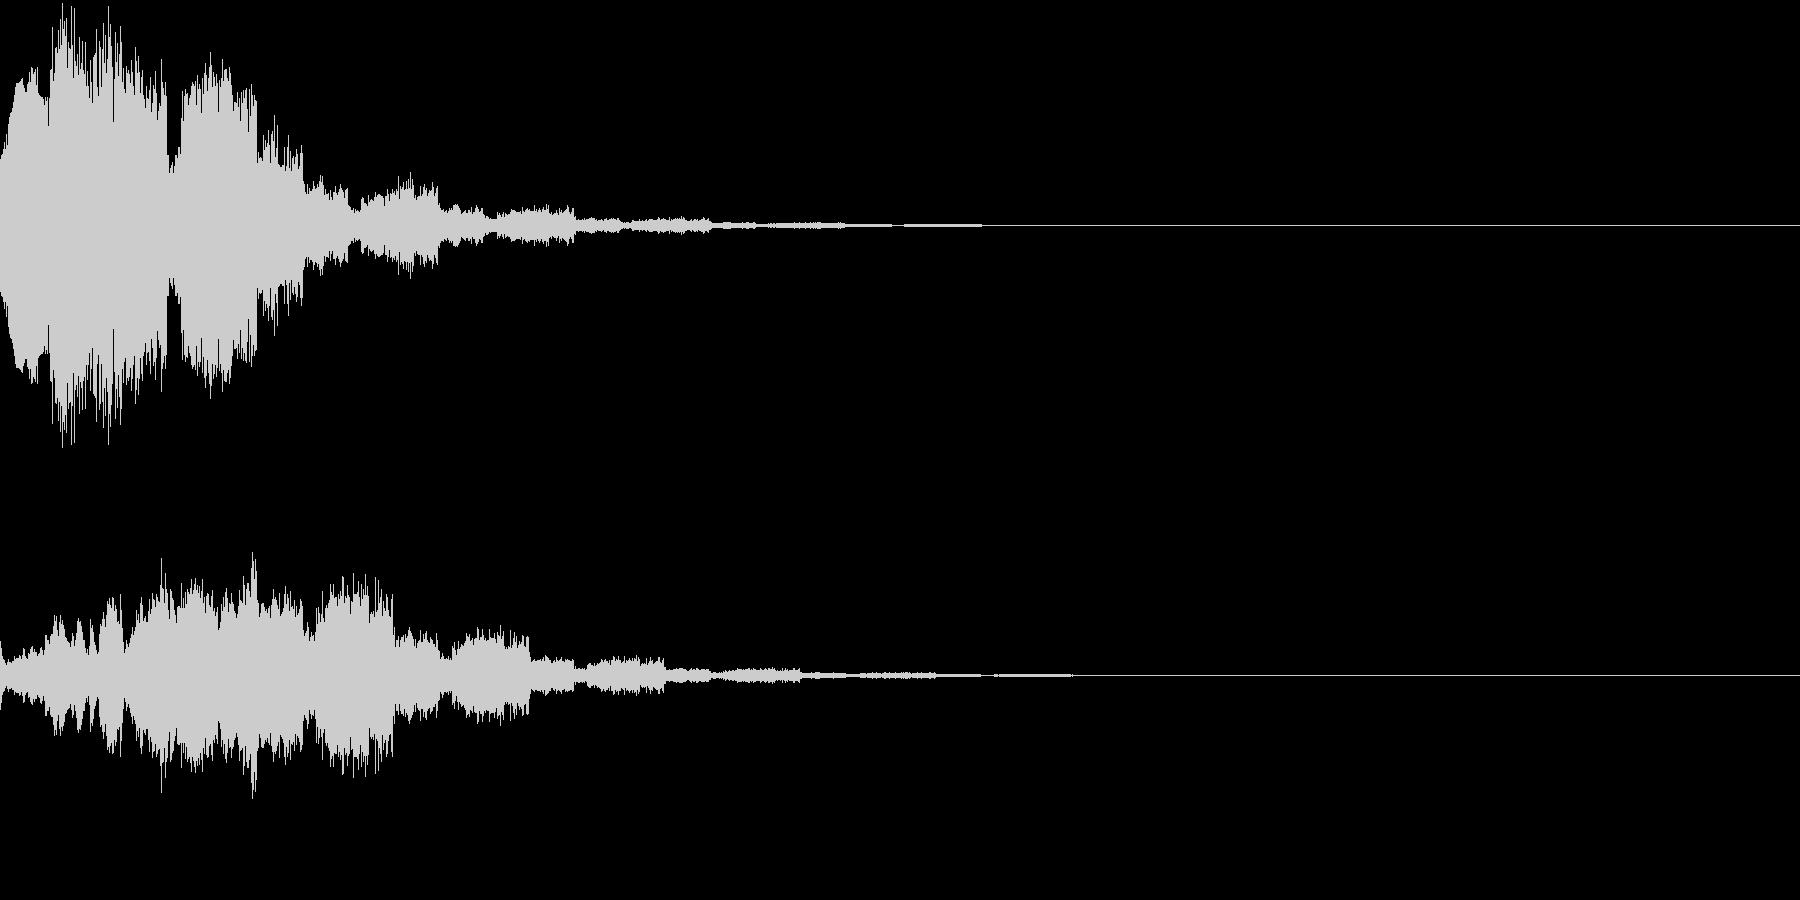 RPG アイテムゲット音の未再生の波形